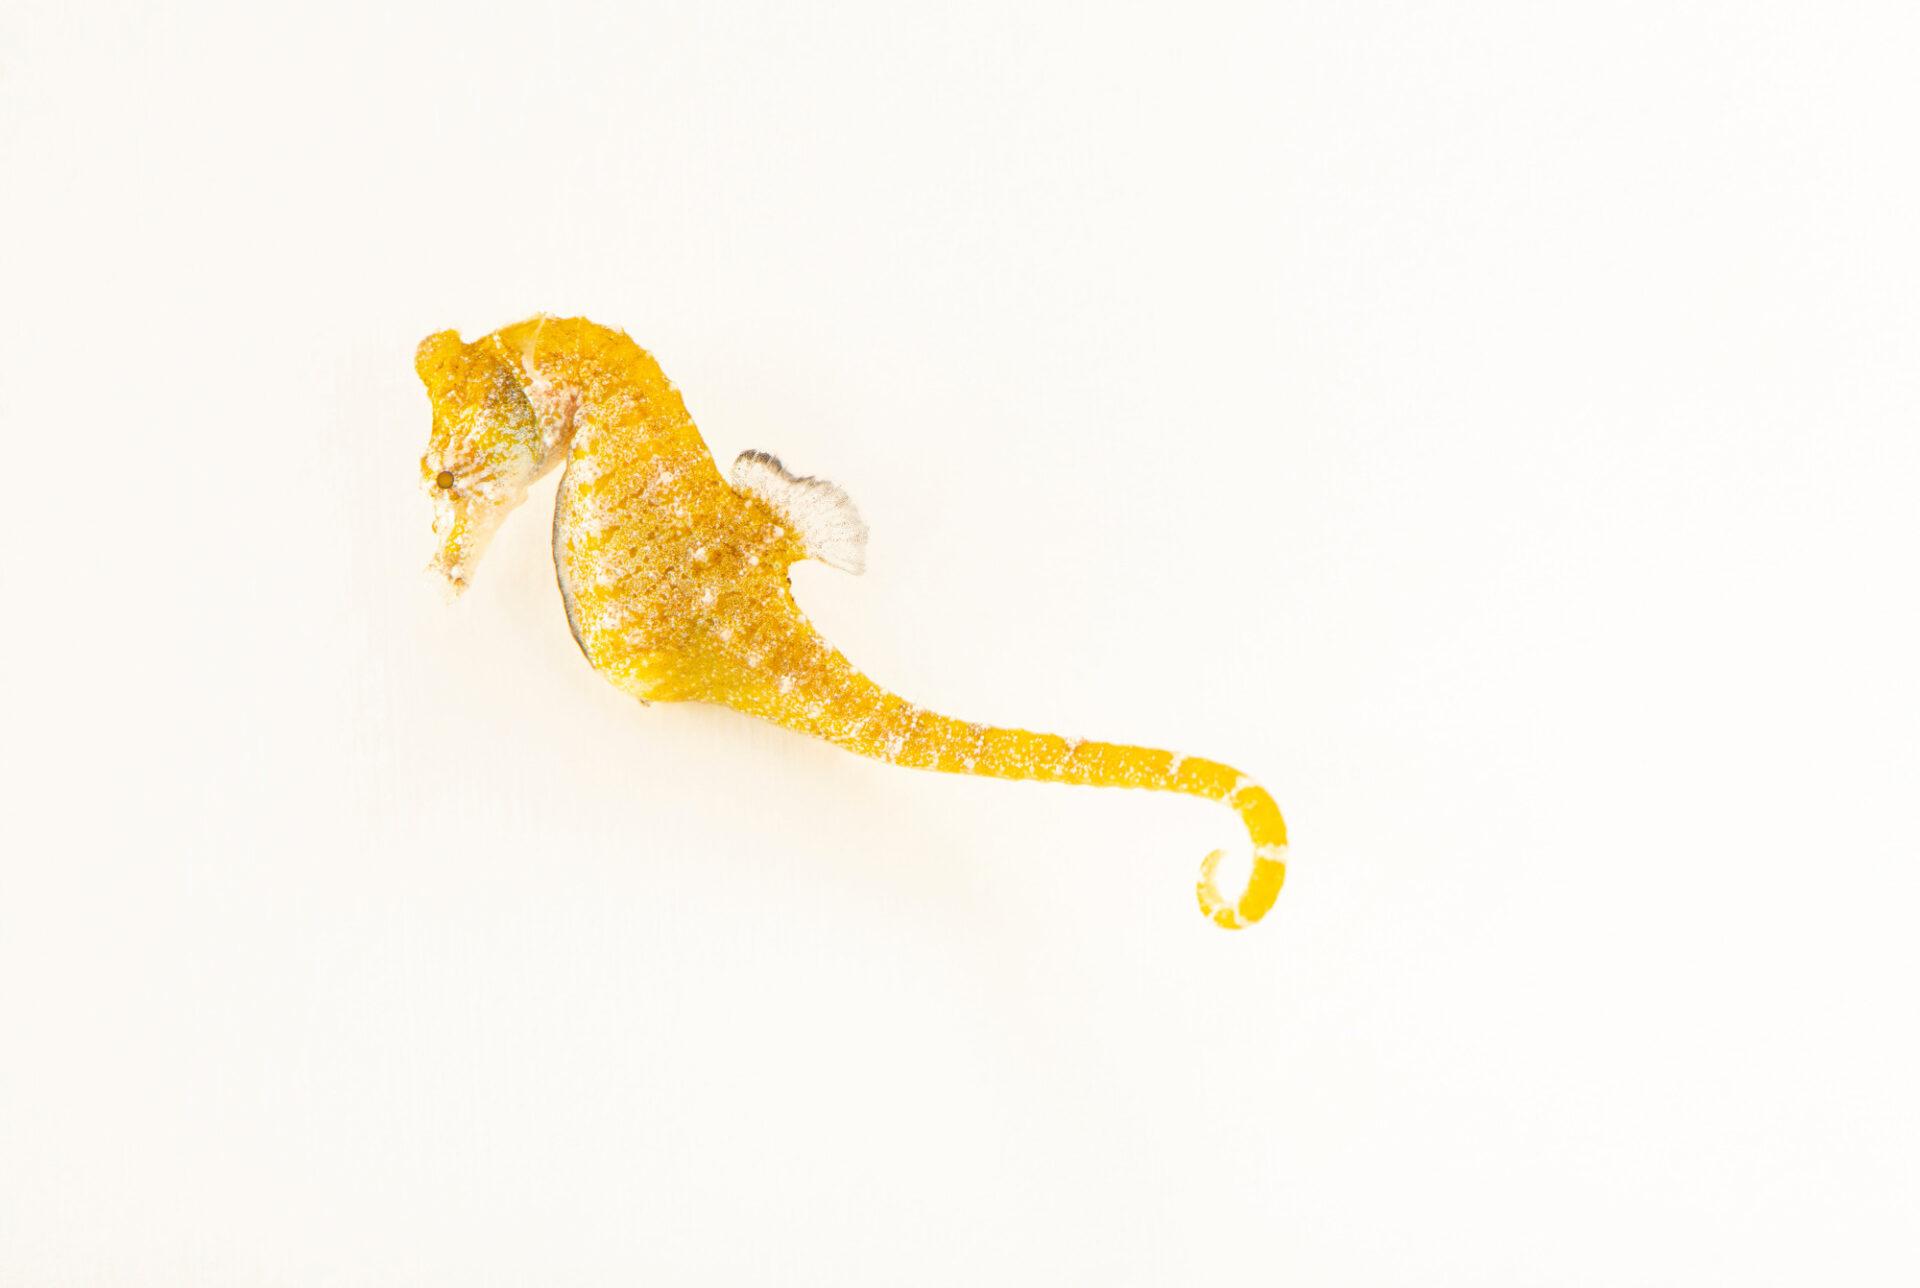 Photo: A dwarf seahorse (Hippocampus zosterae) at Aquarium Berlin.